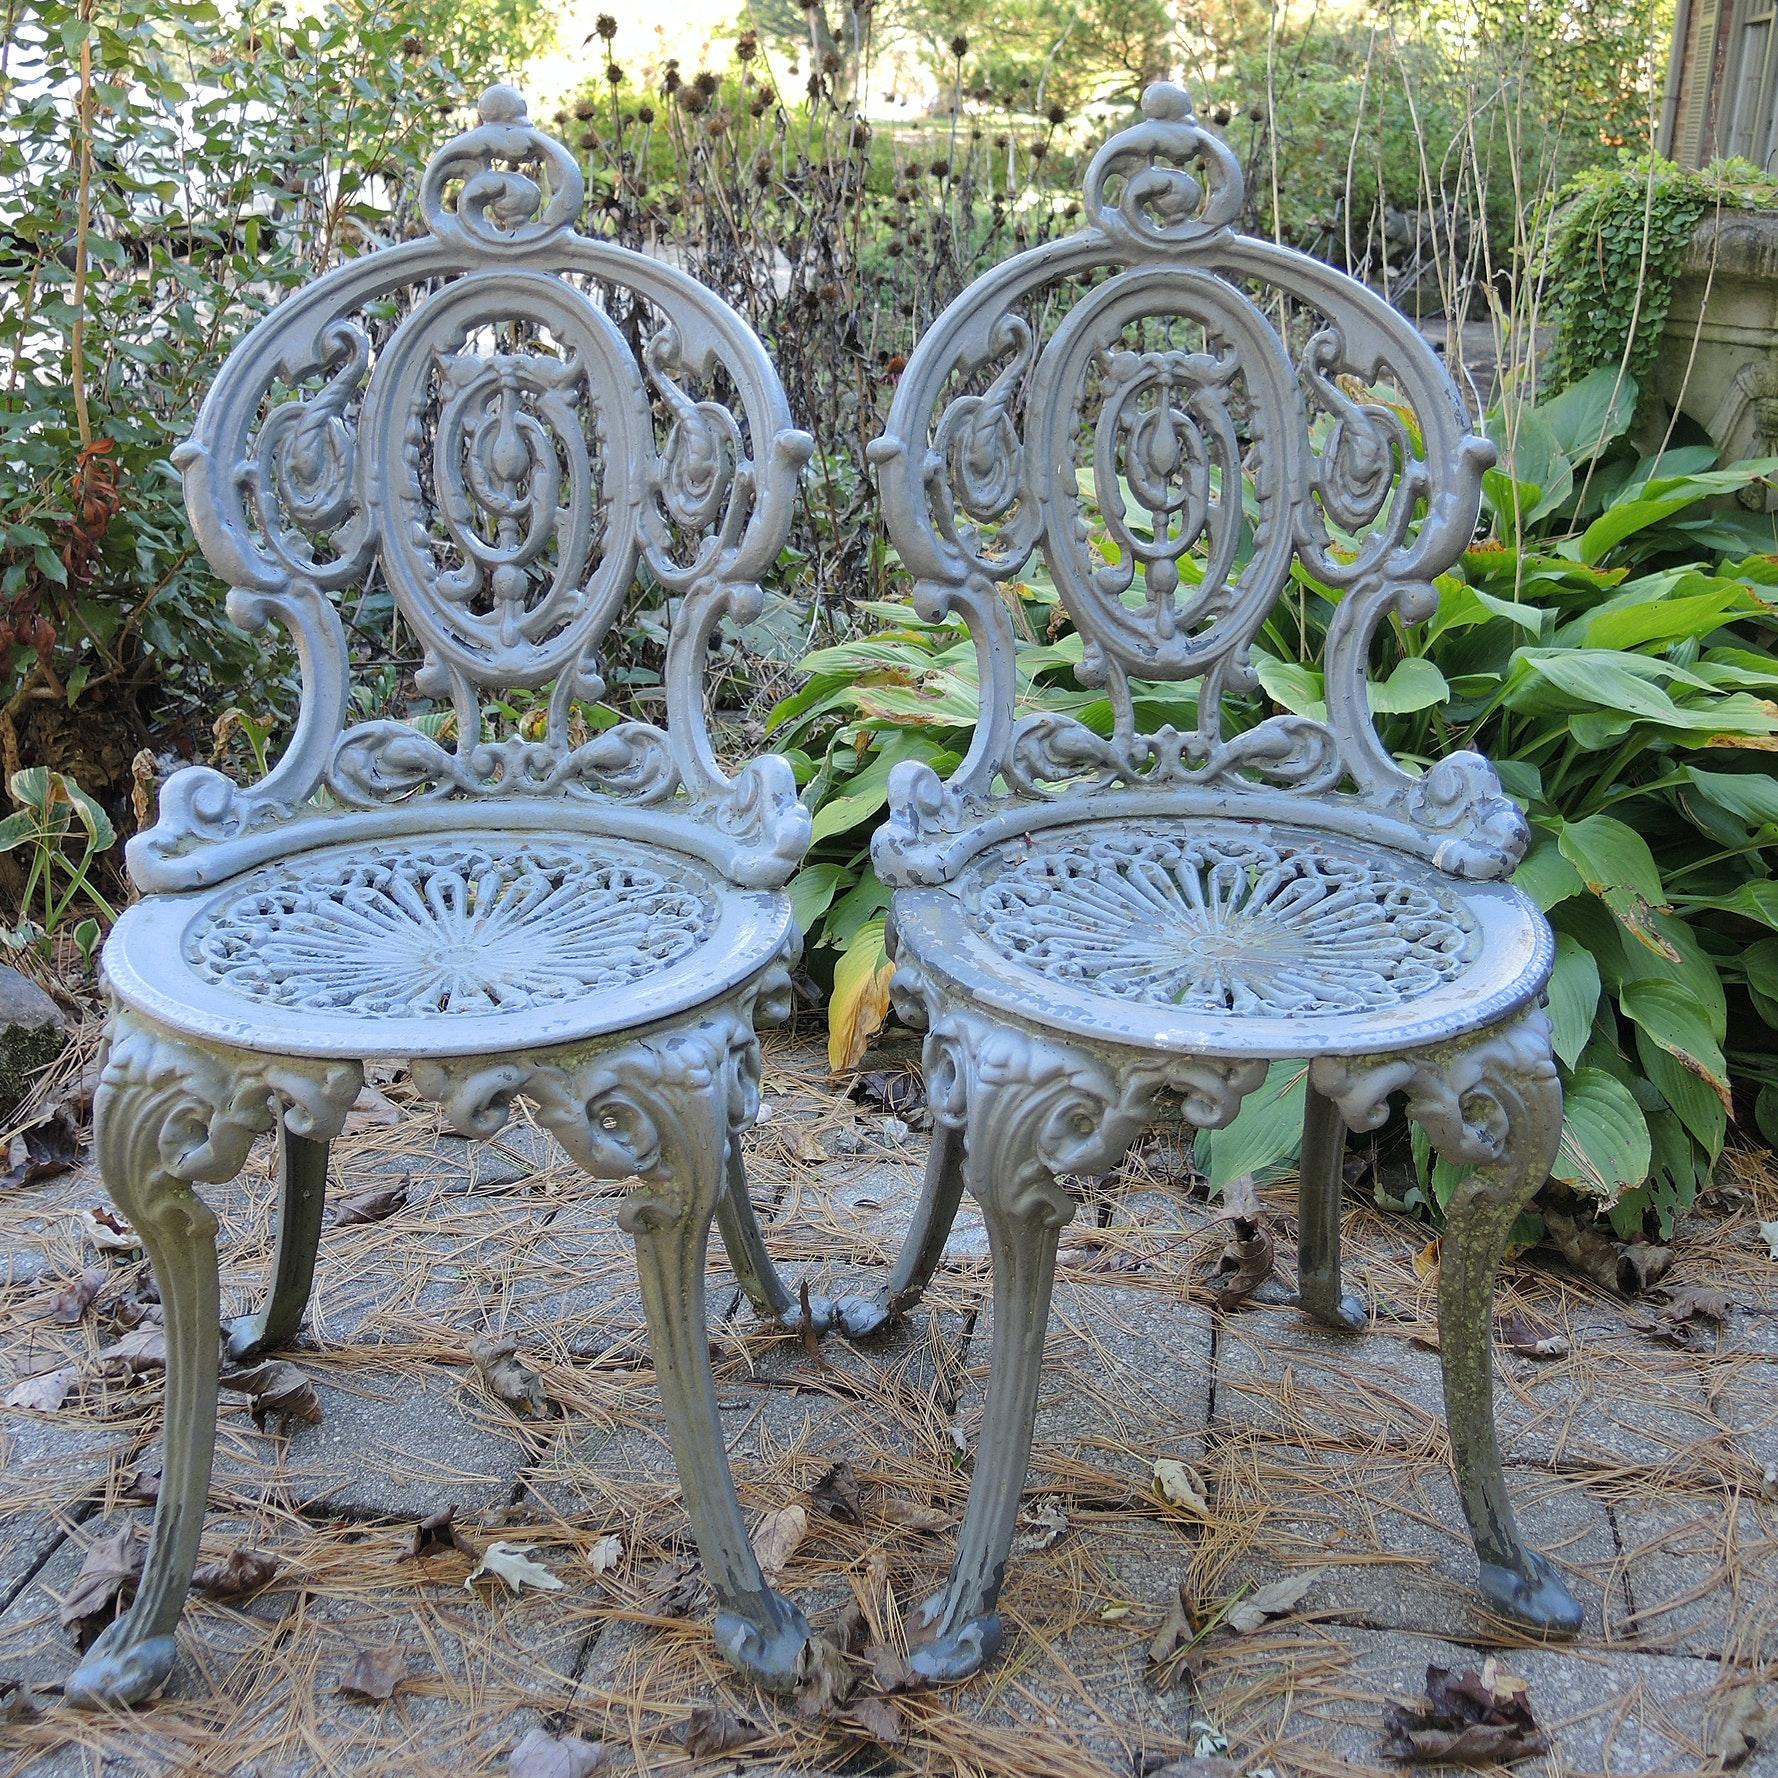 Ornate Vintage Cast Iron Garden Chairs